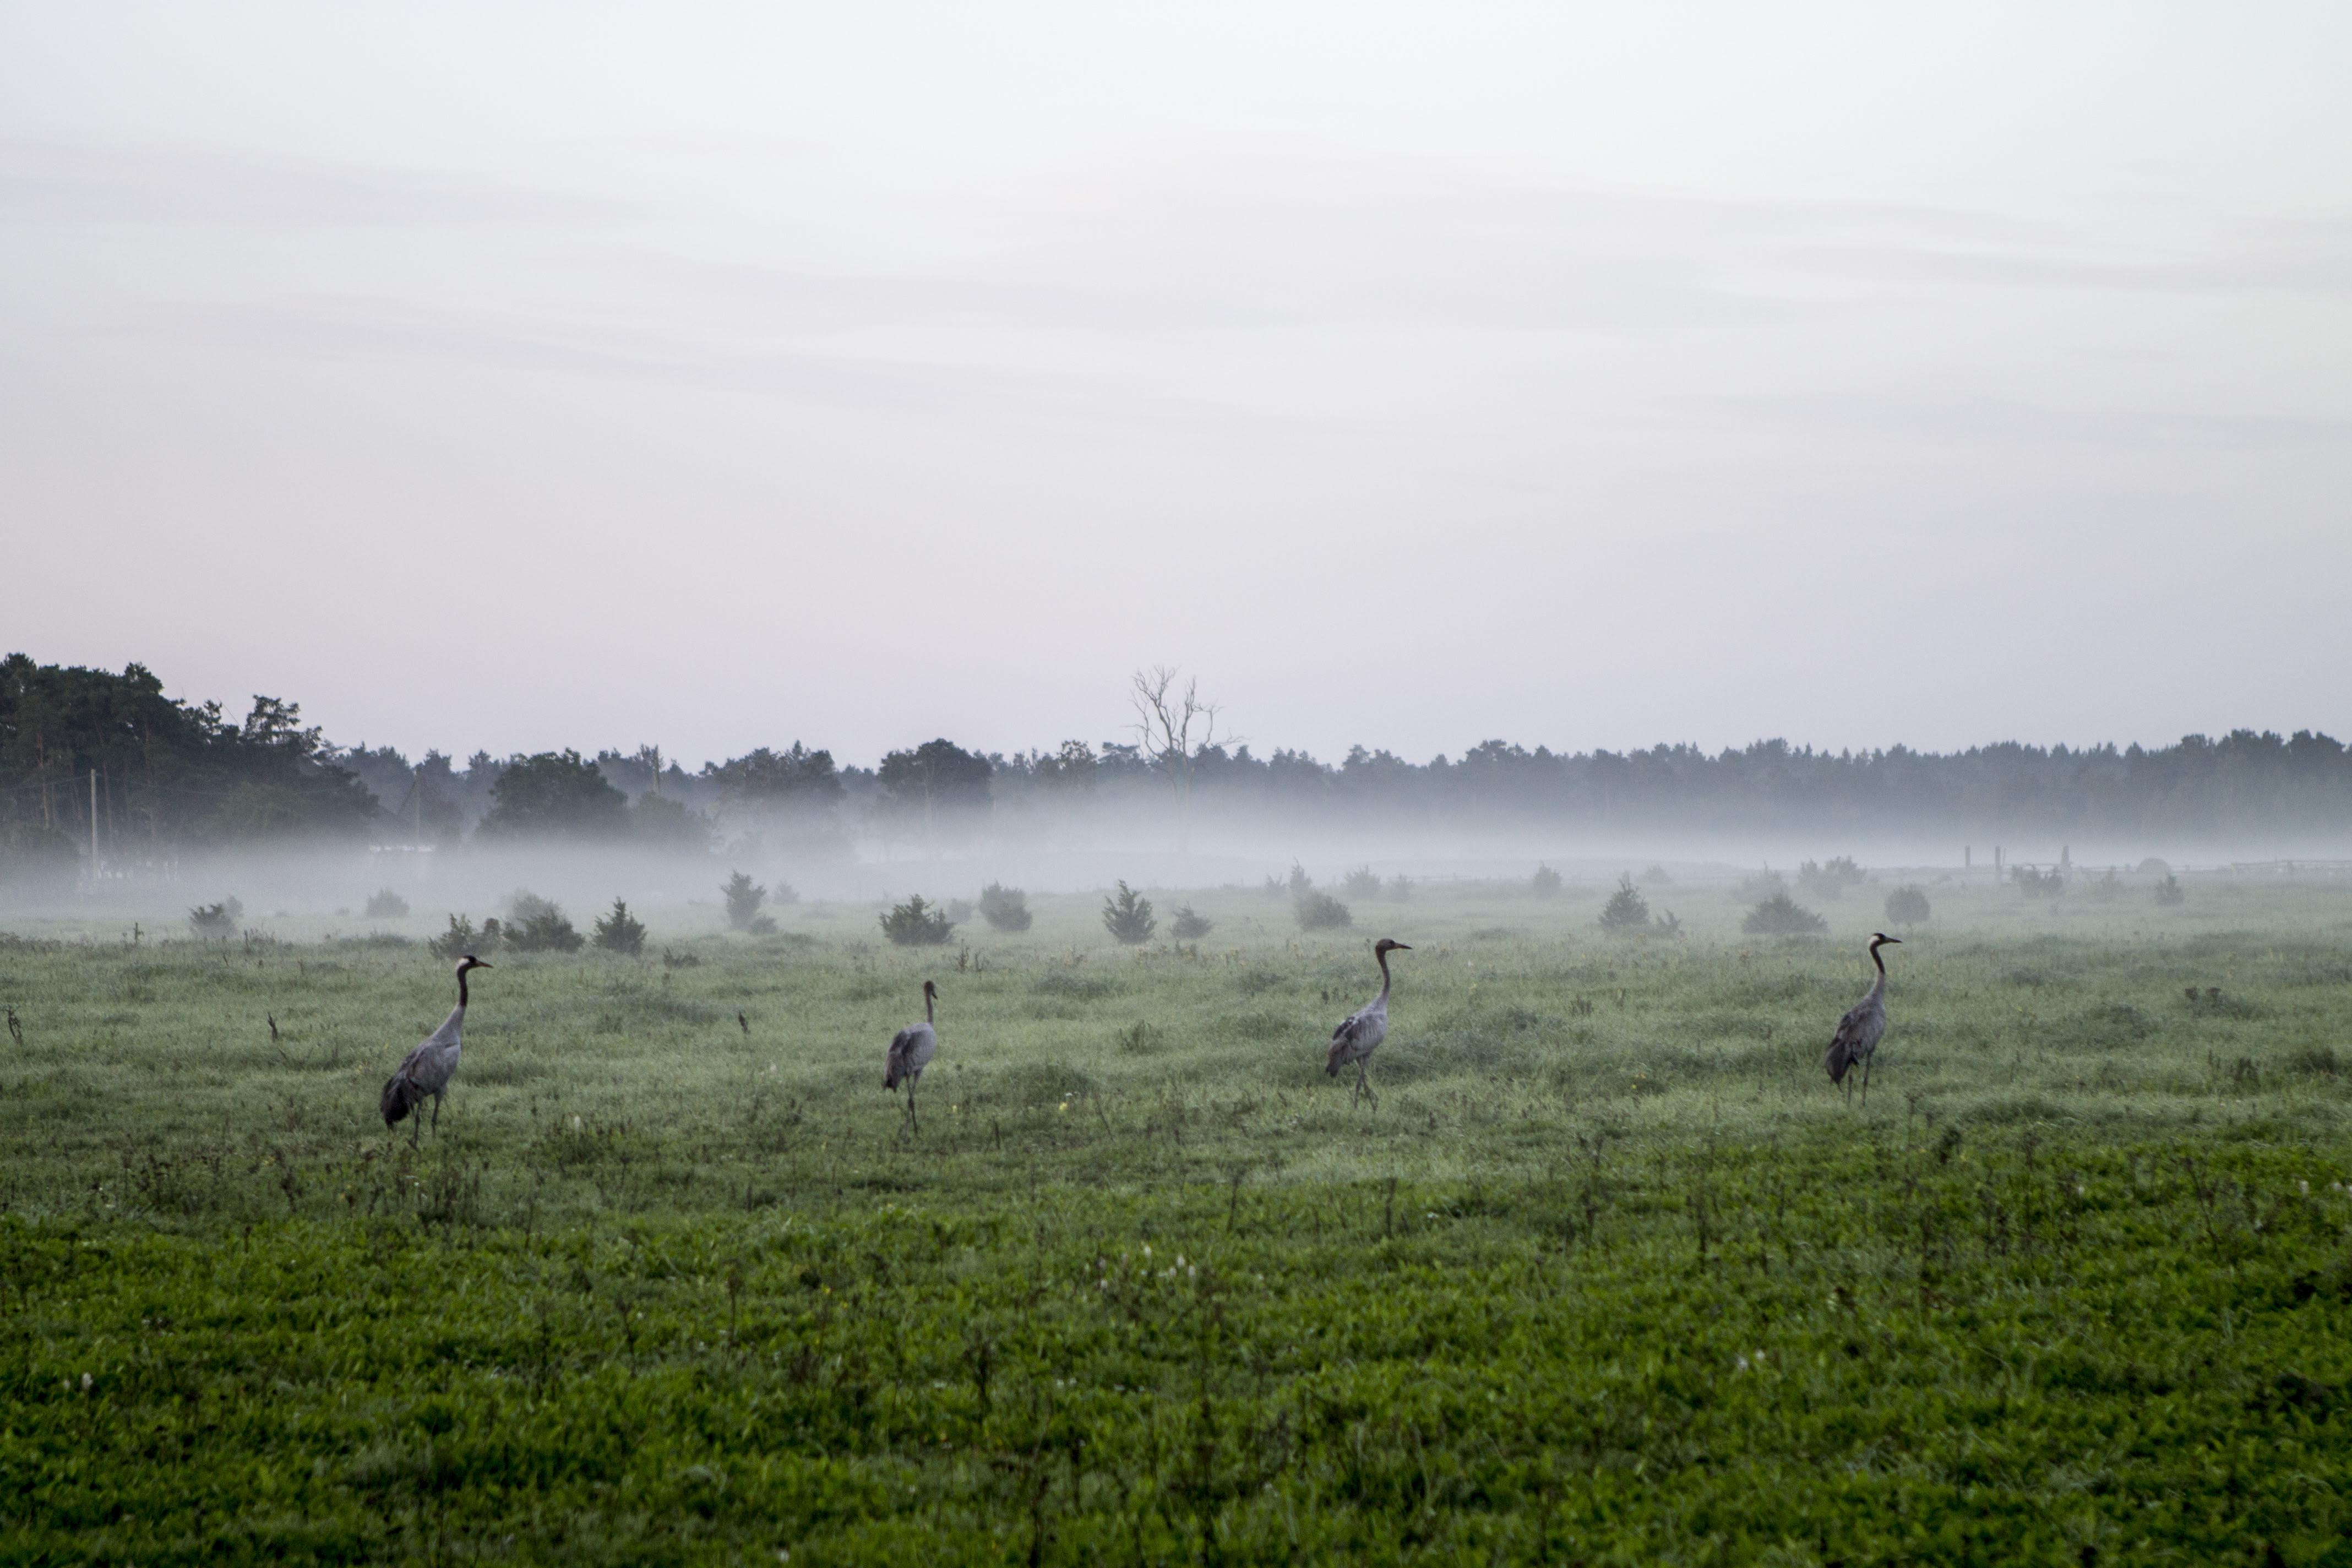 Saaremaa is a pradise for bird watching